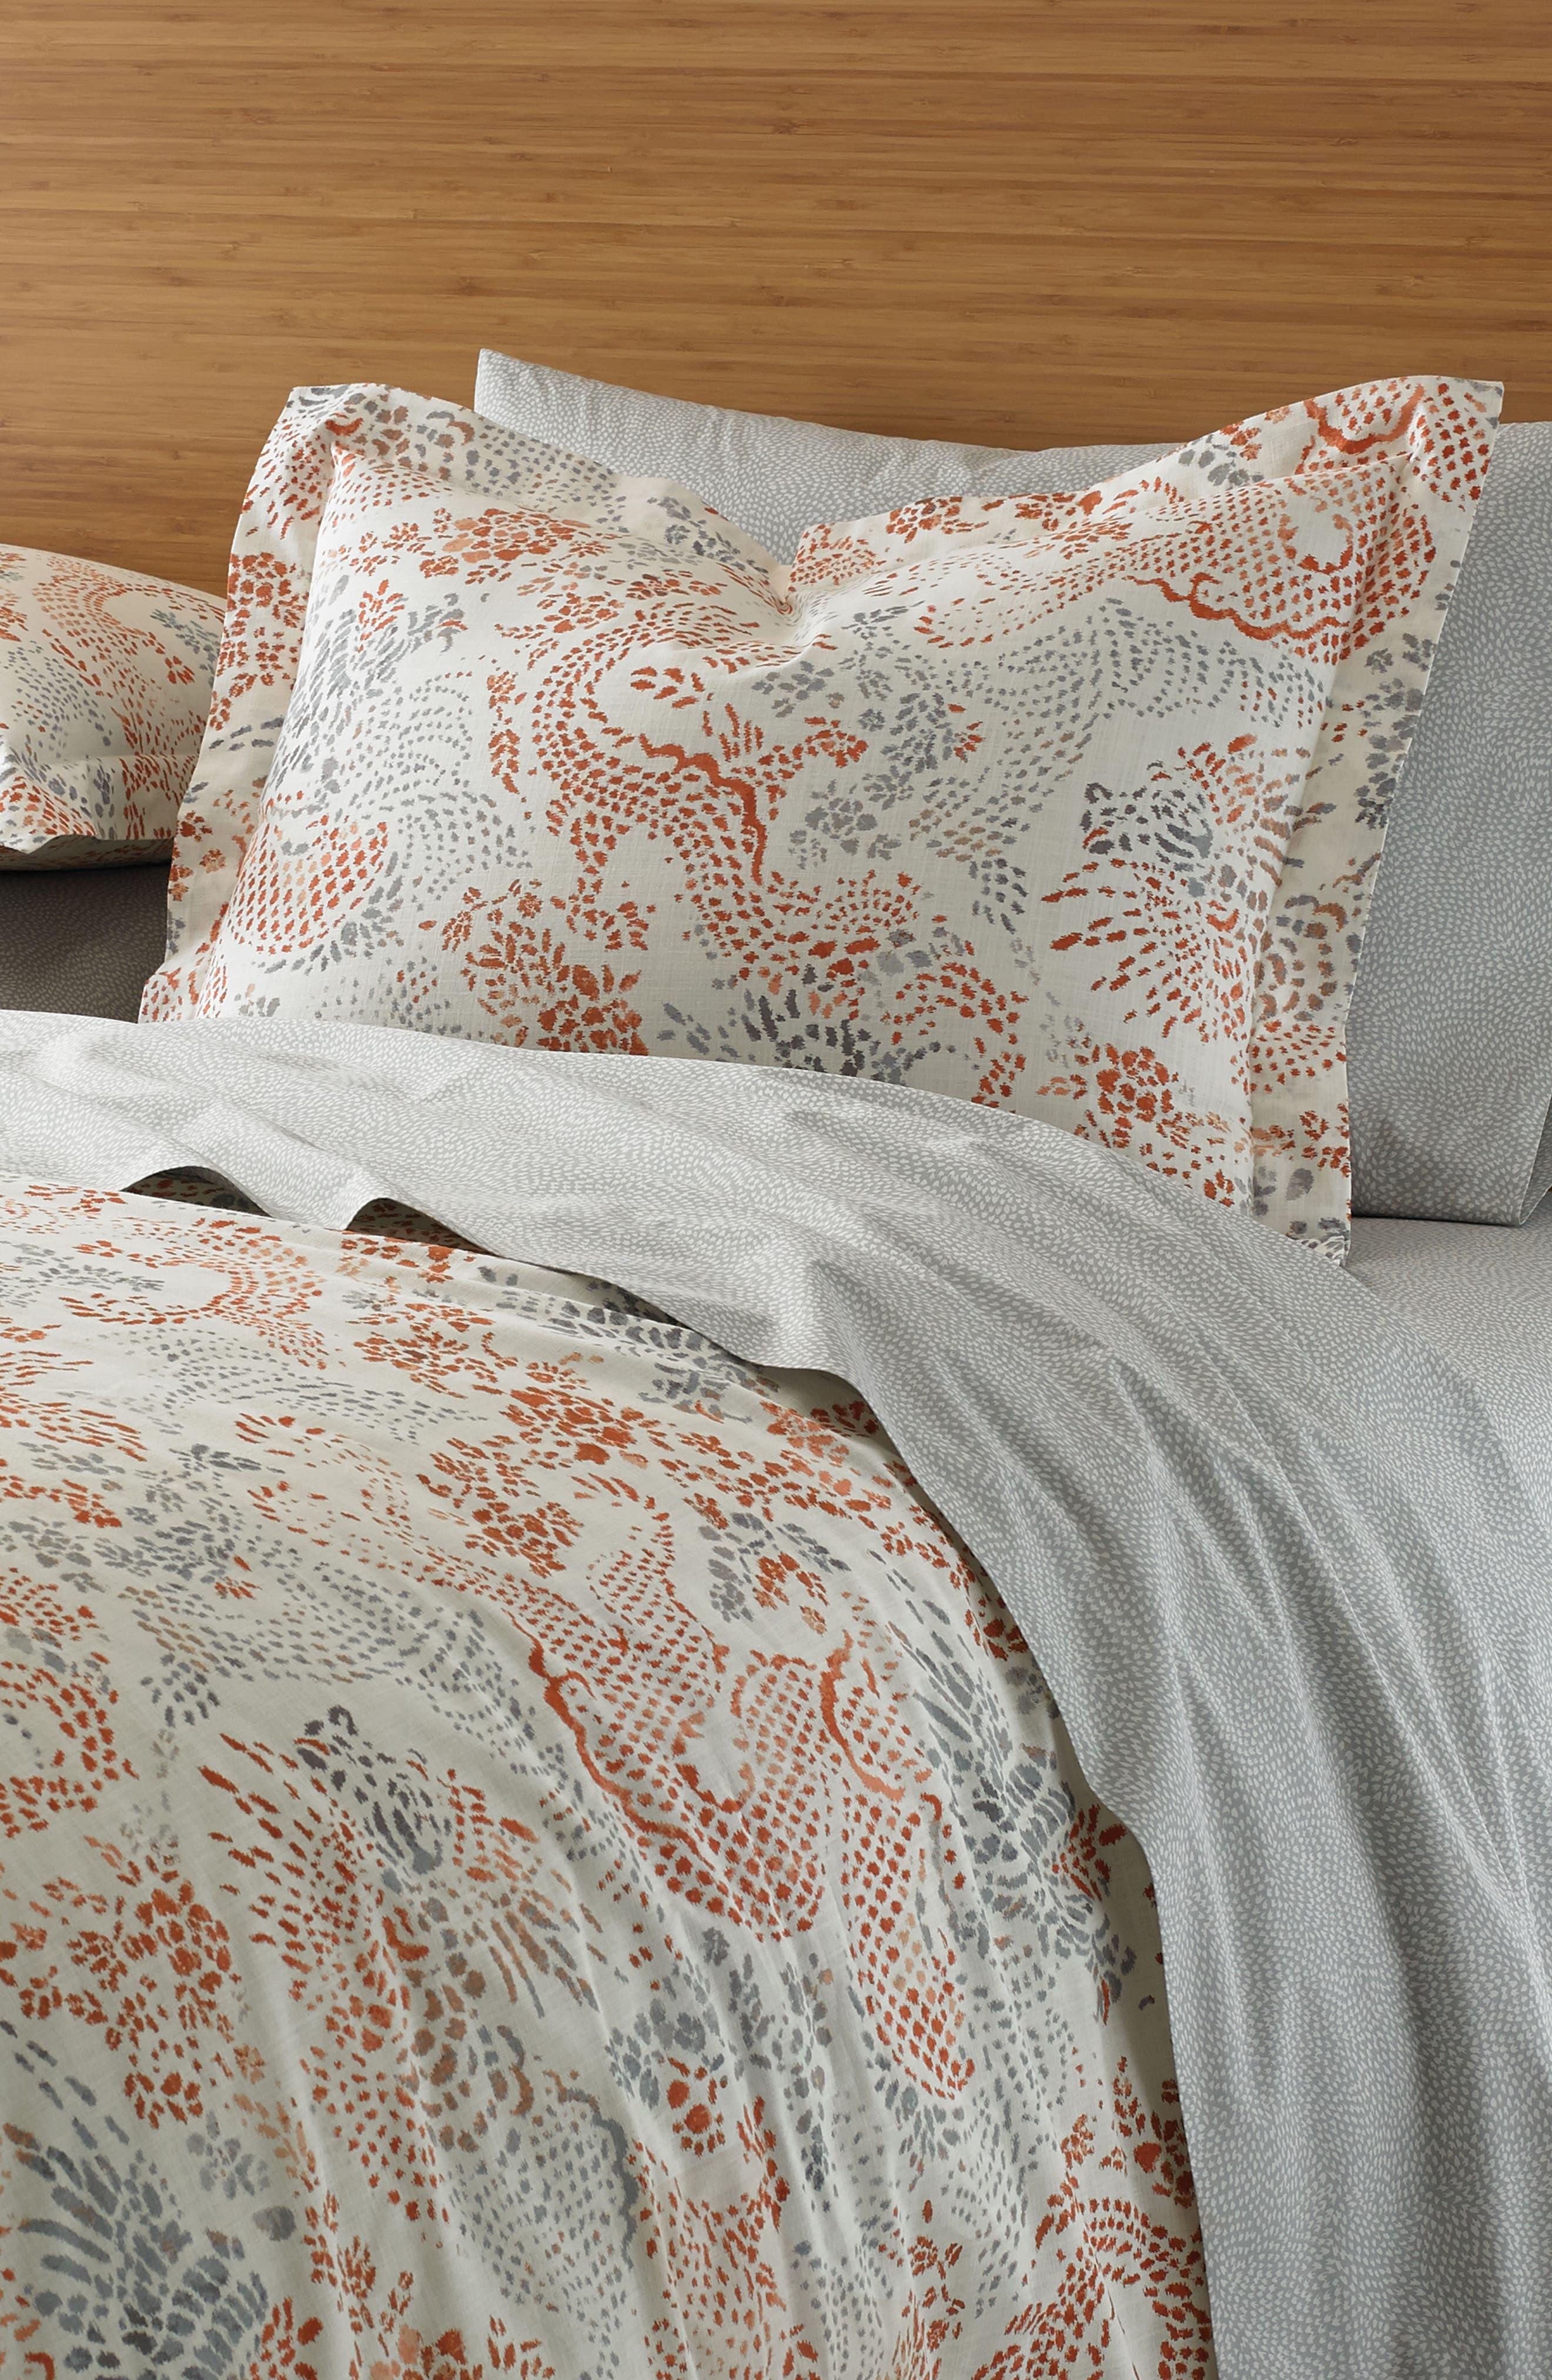 Jakarta Comforter,                             Alternate thumbnail 2, color,                             Sienna Multi